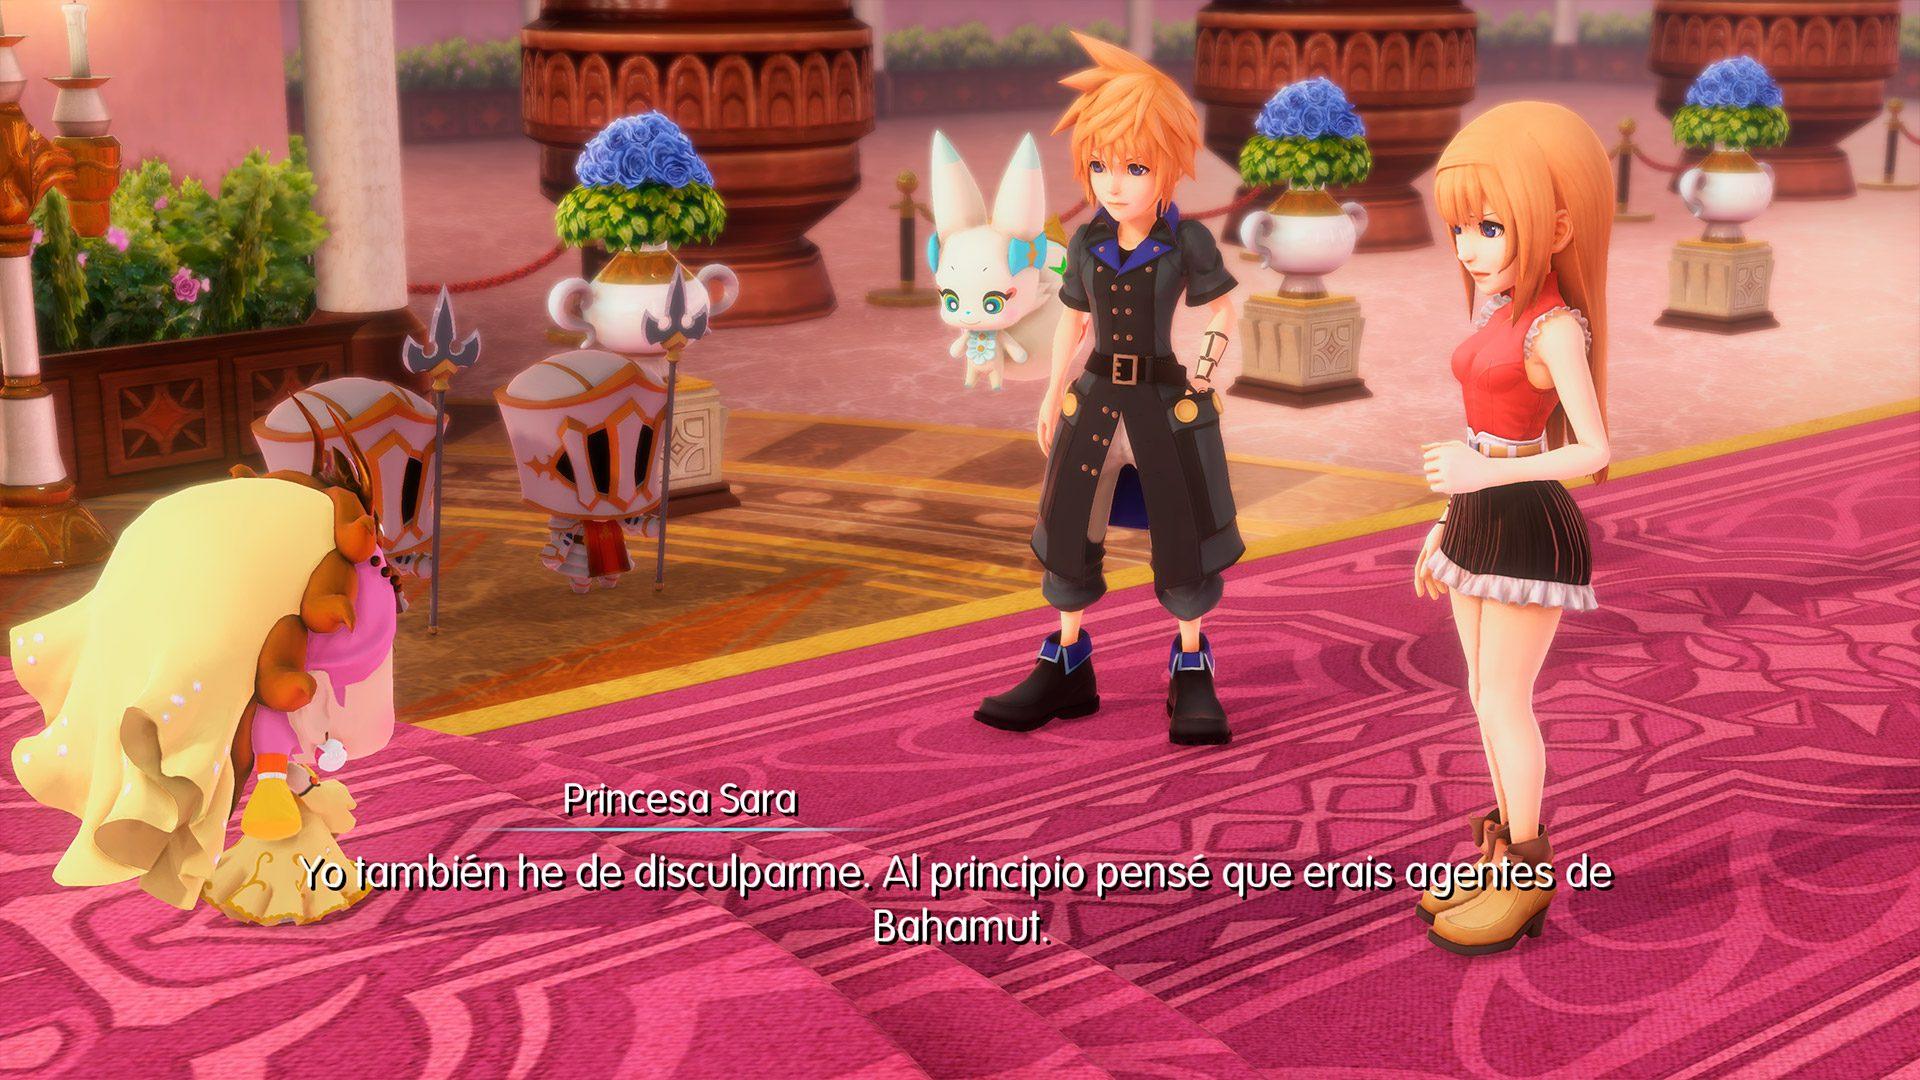 Análisis de World of Final Fantasy Maxima 1